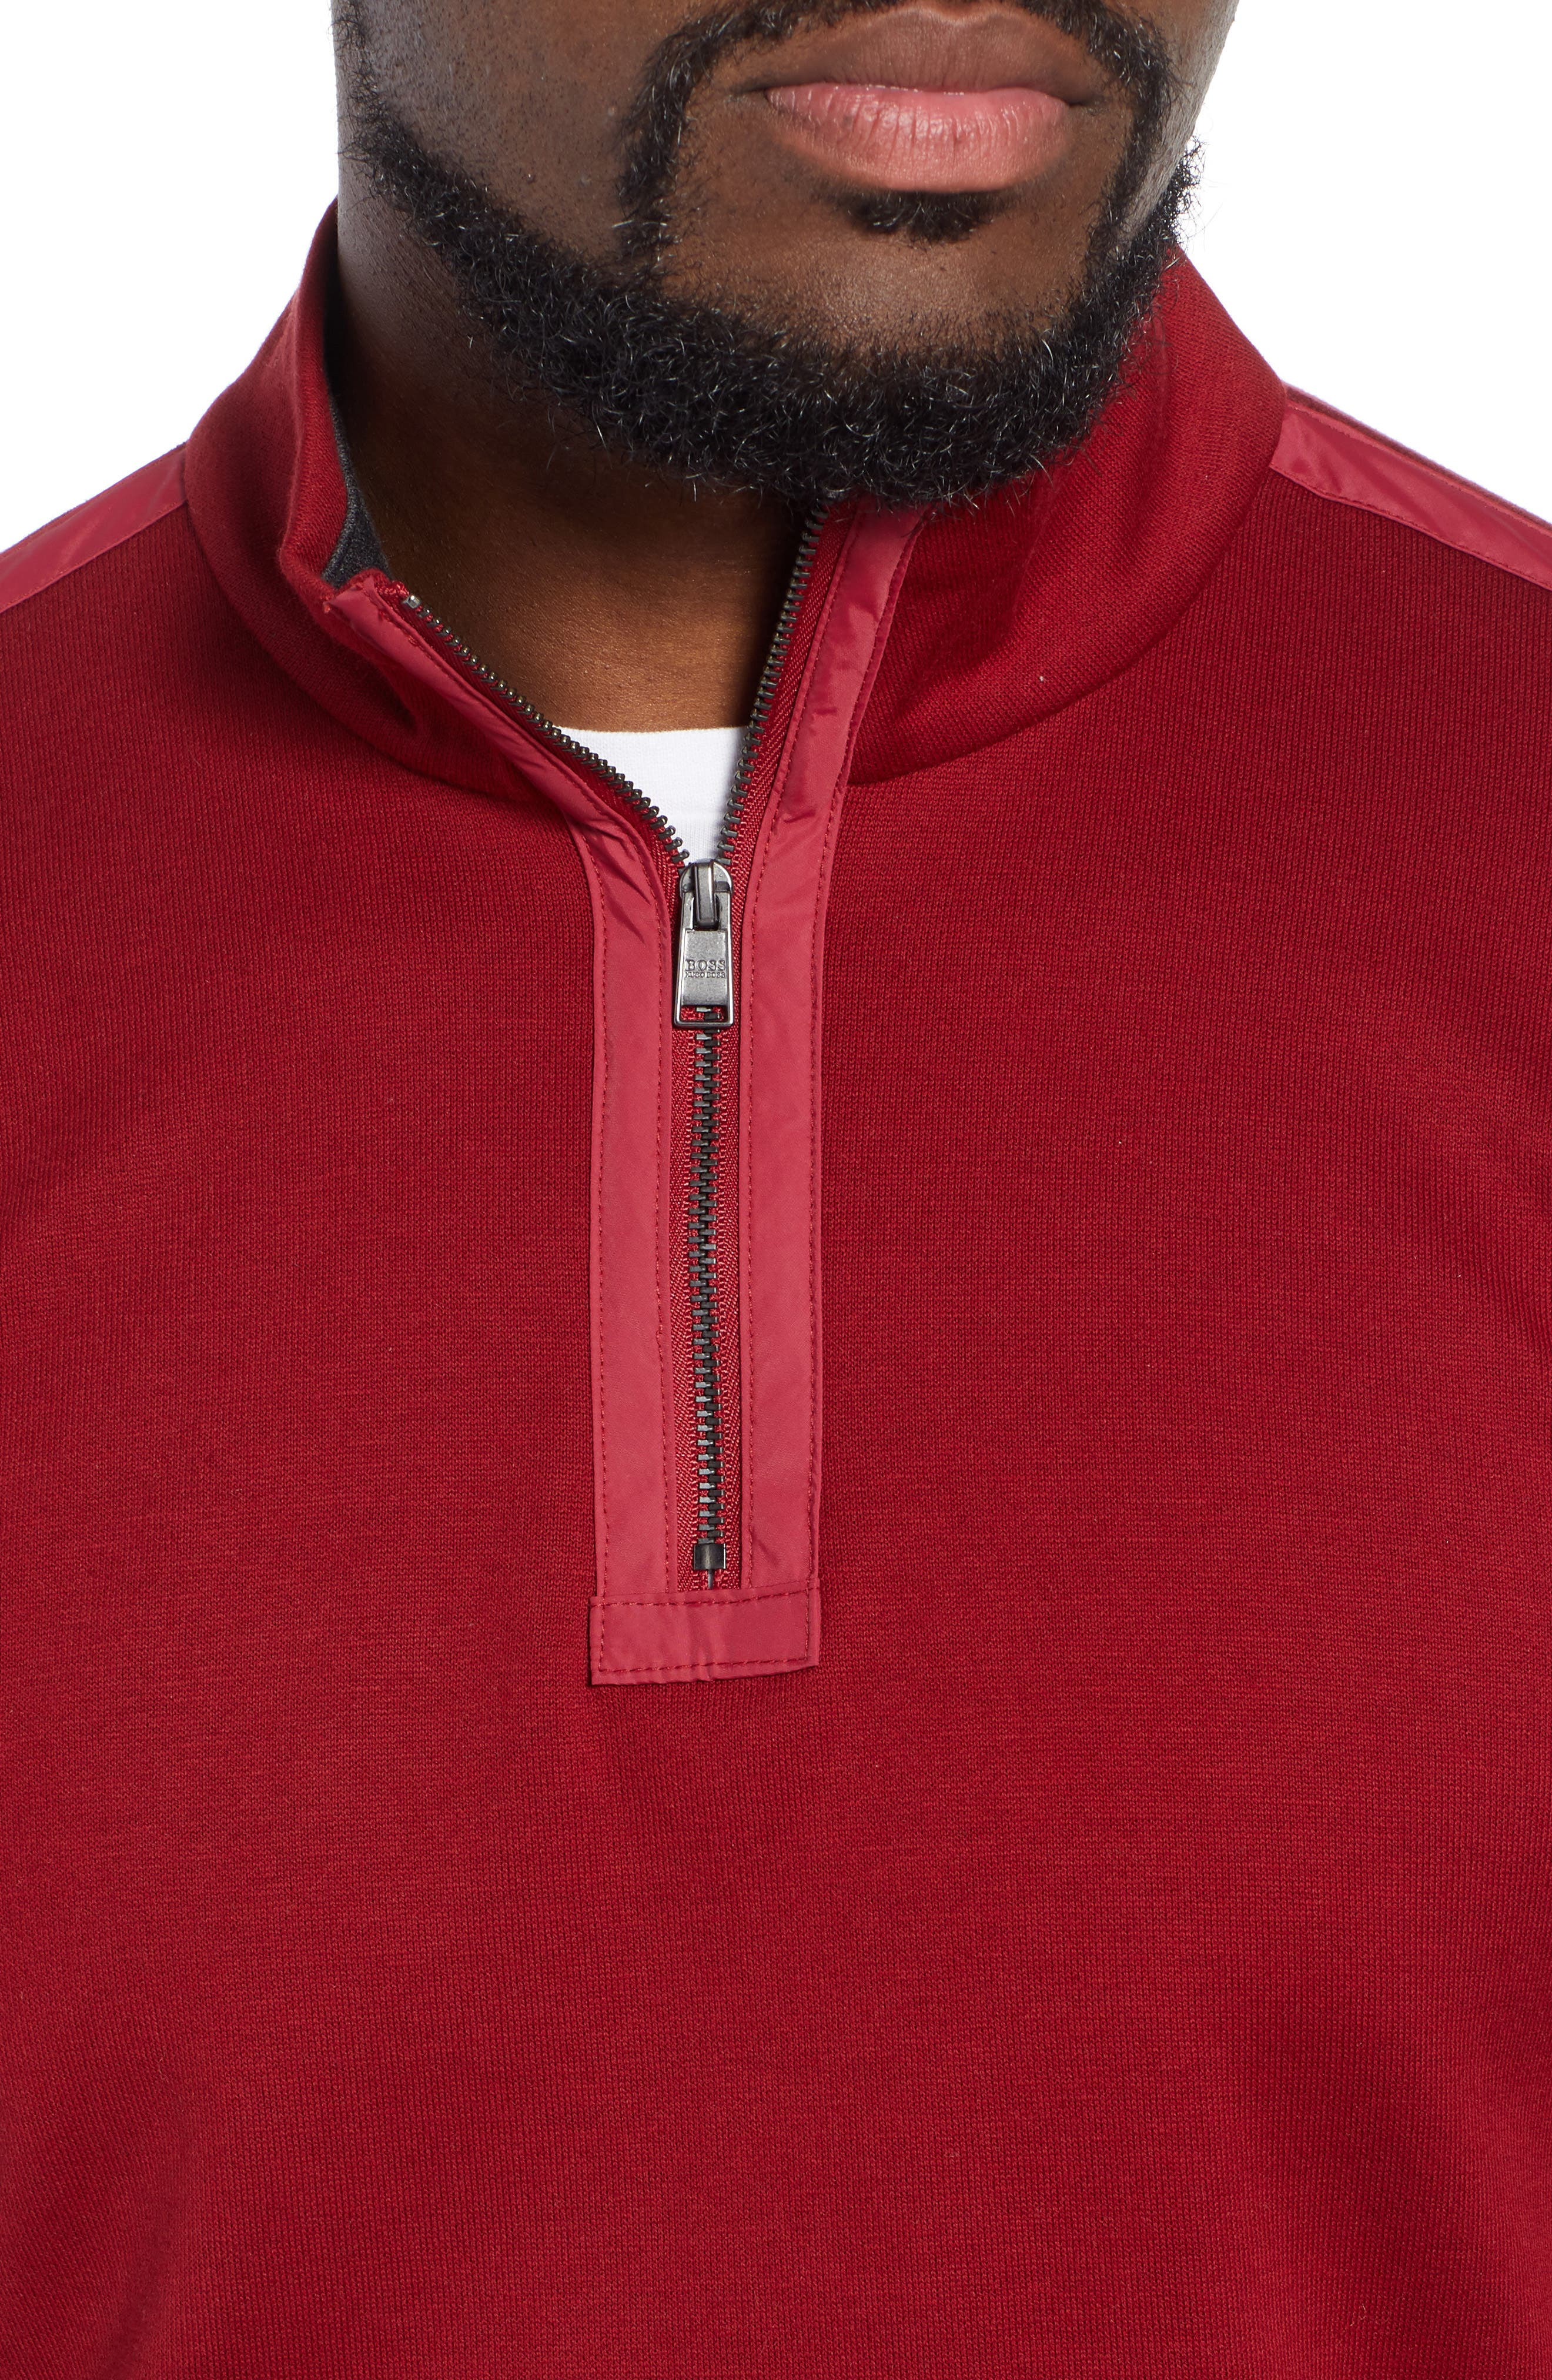 Sidney Quarter Zip Pullover,                             Alternate thumbnail 34, color,